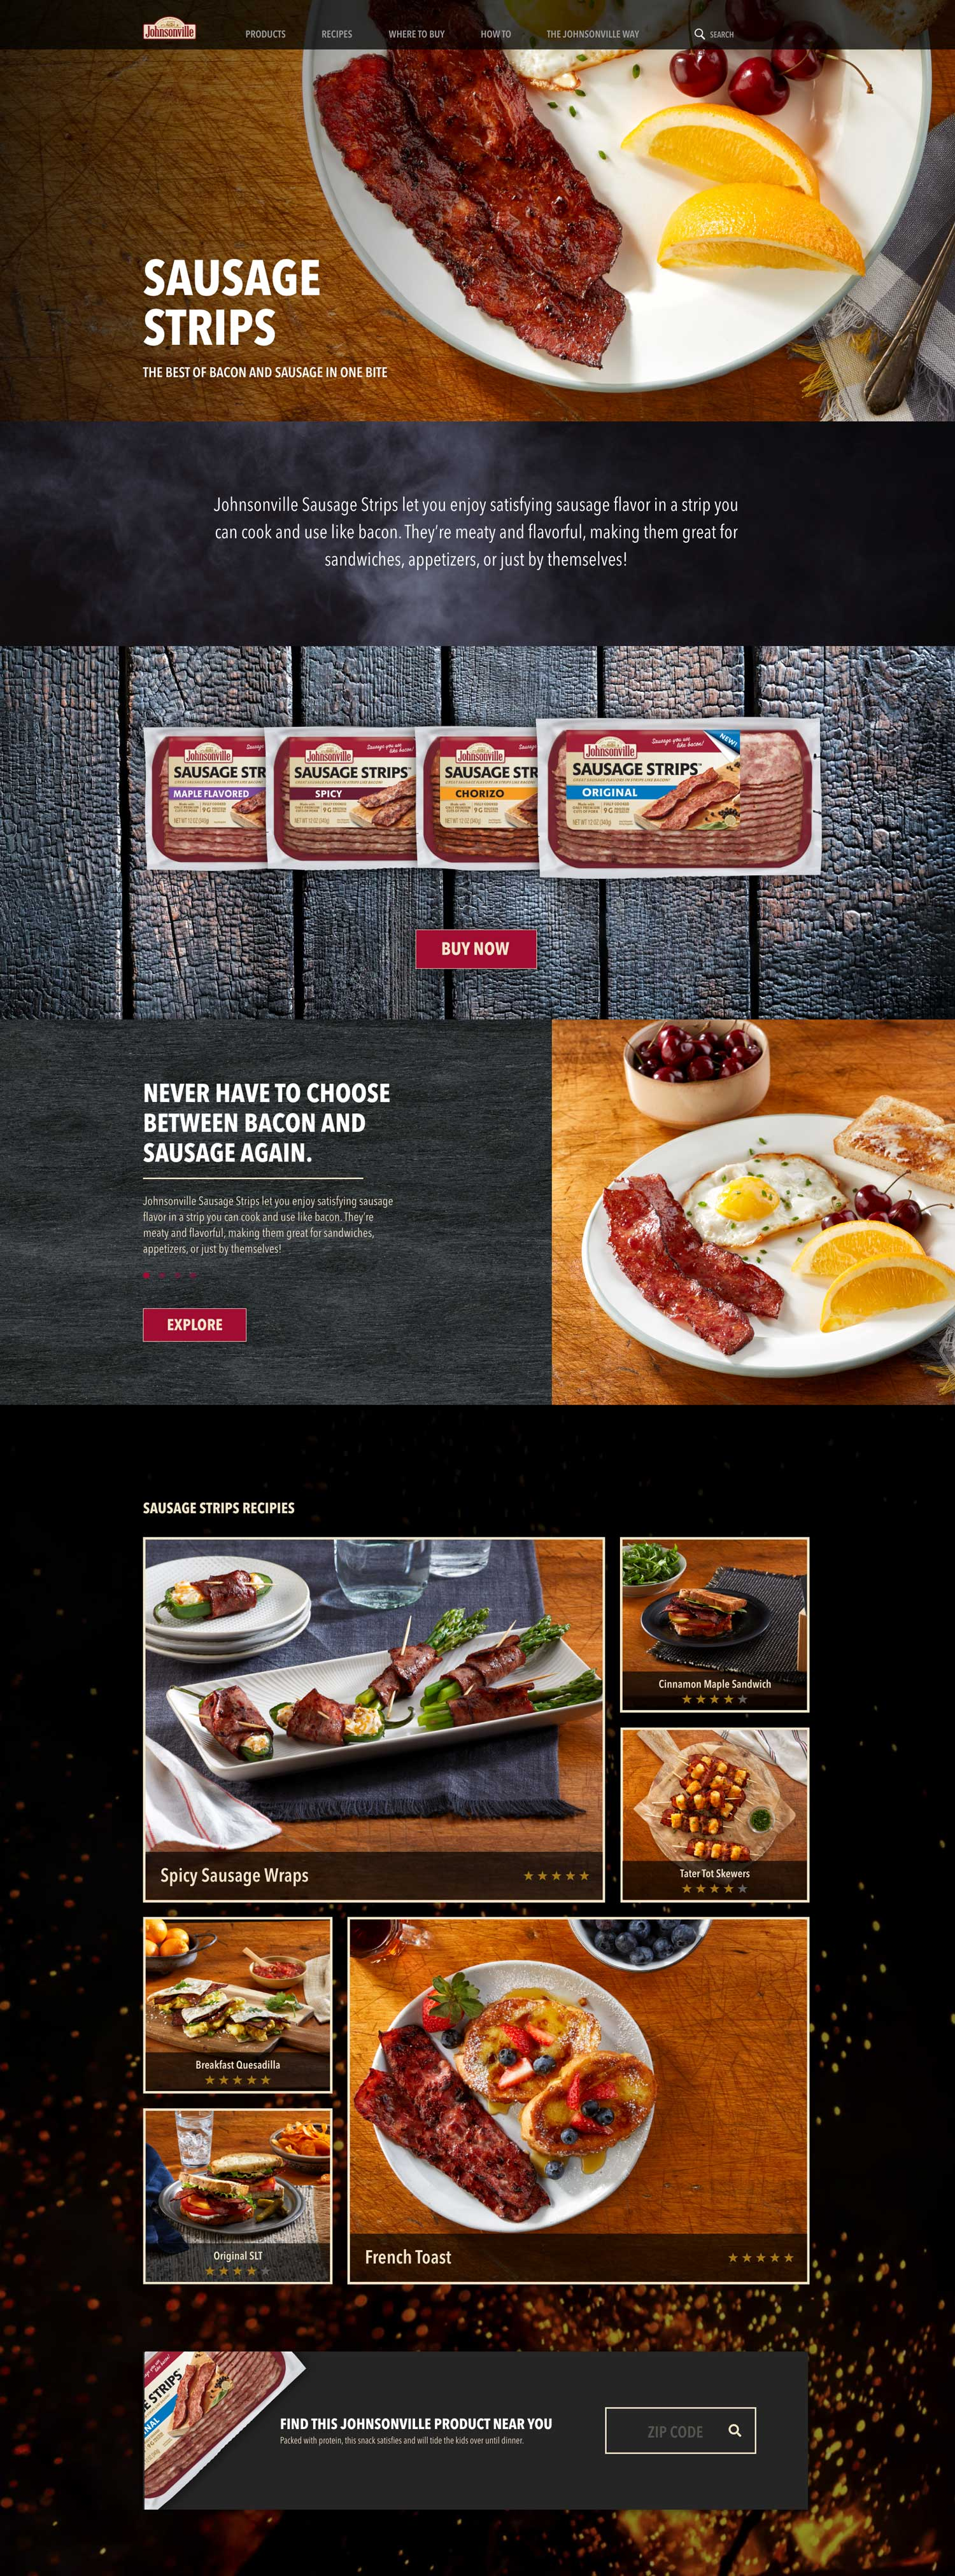 sausage strips design